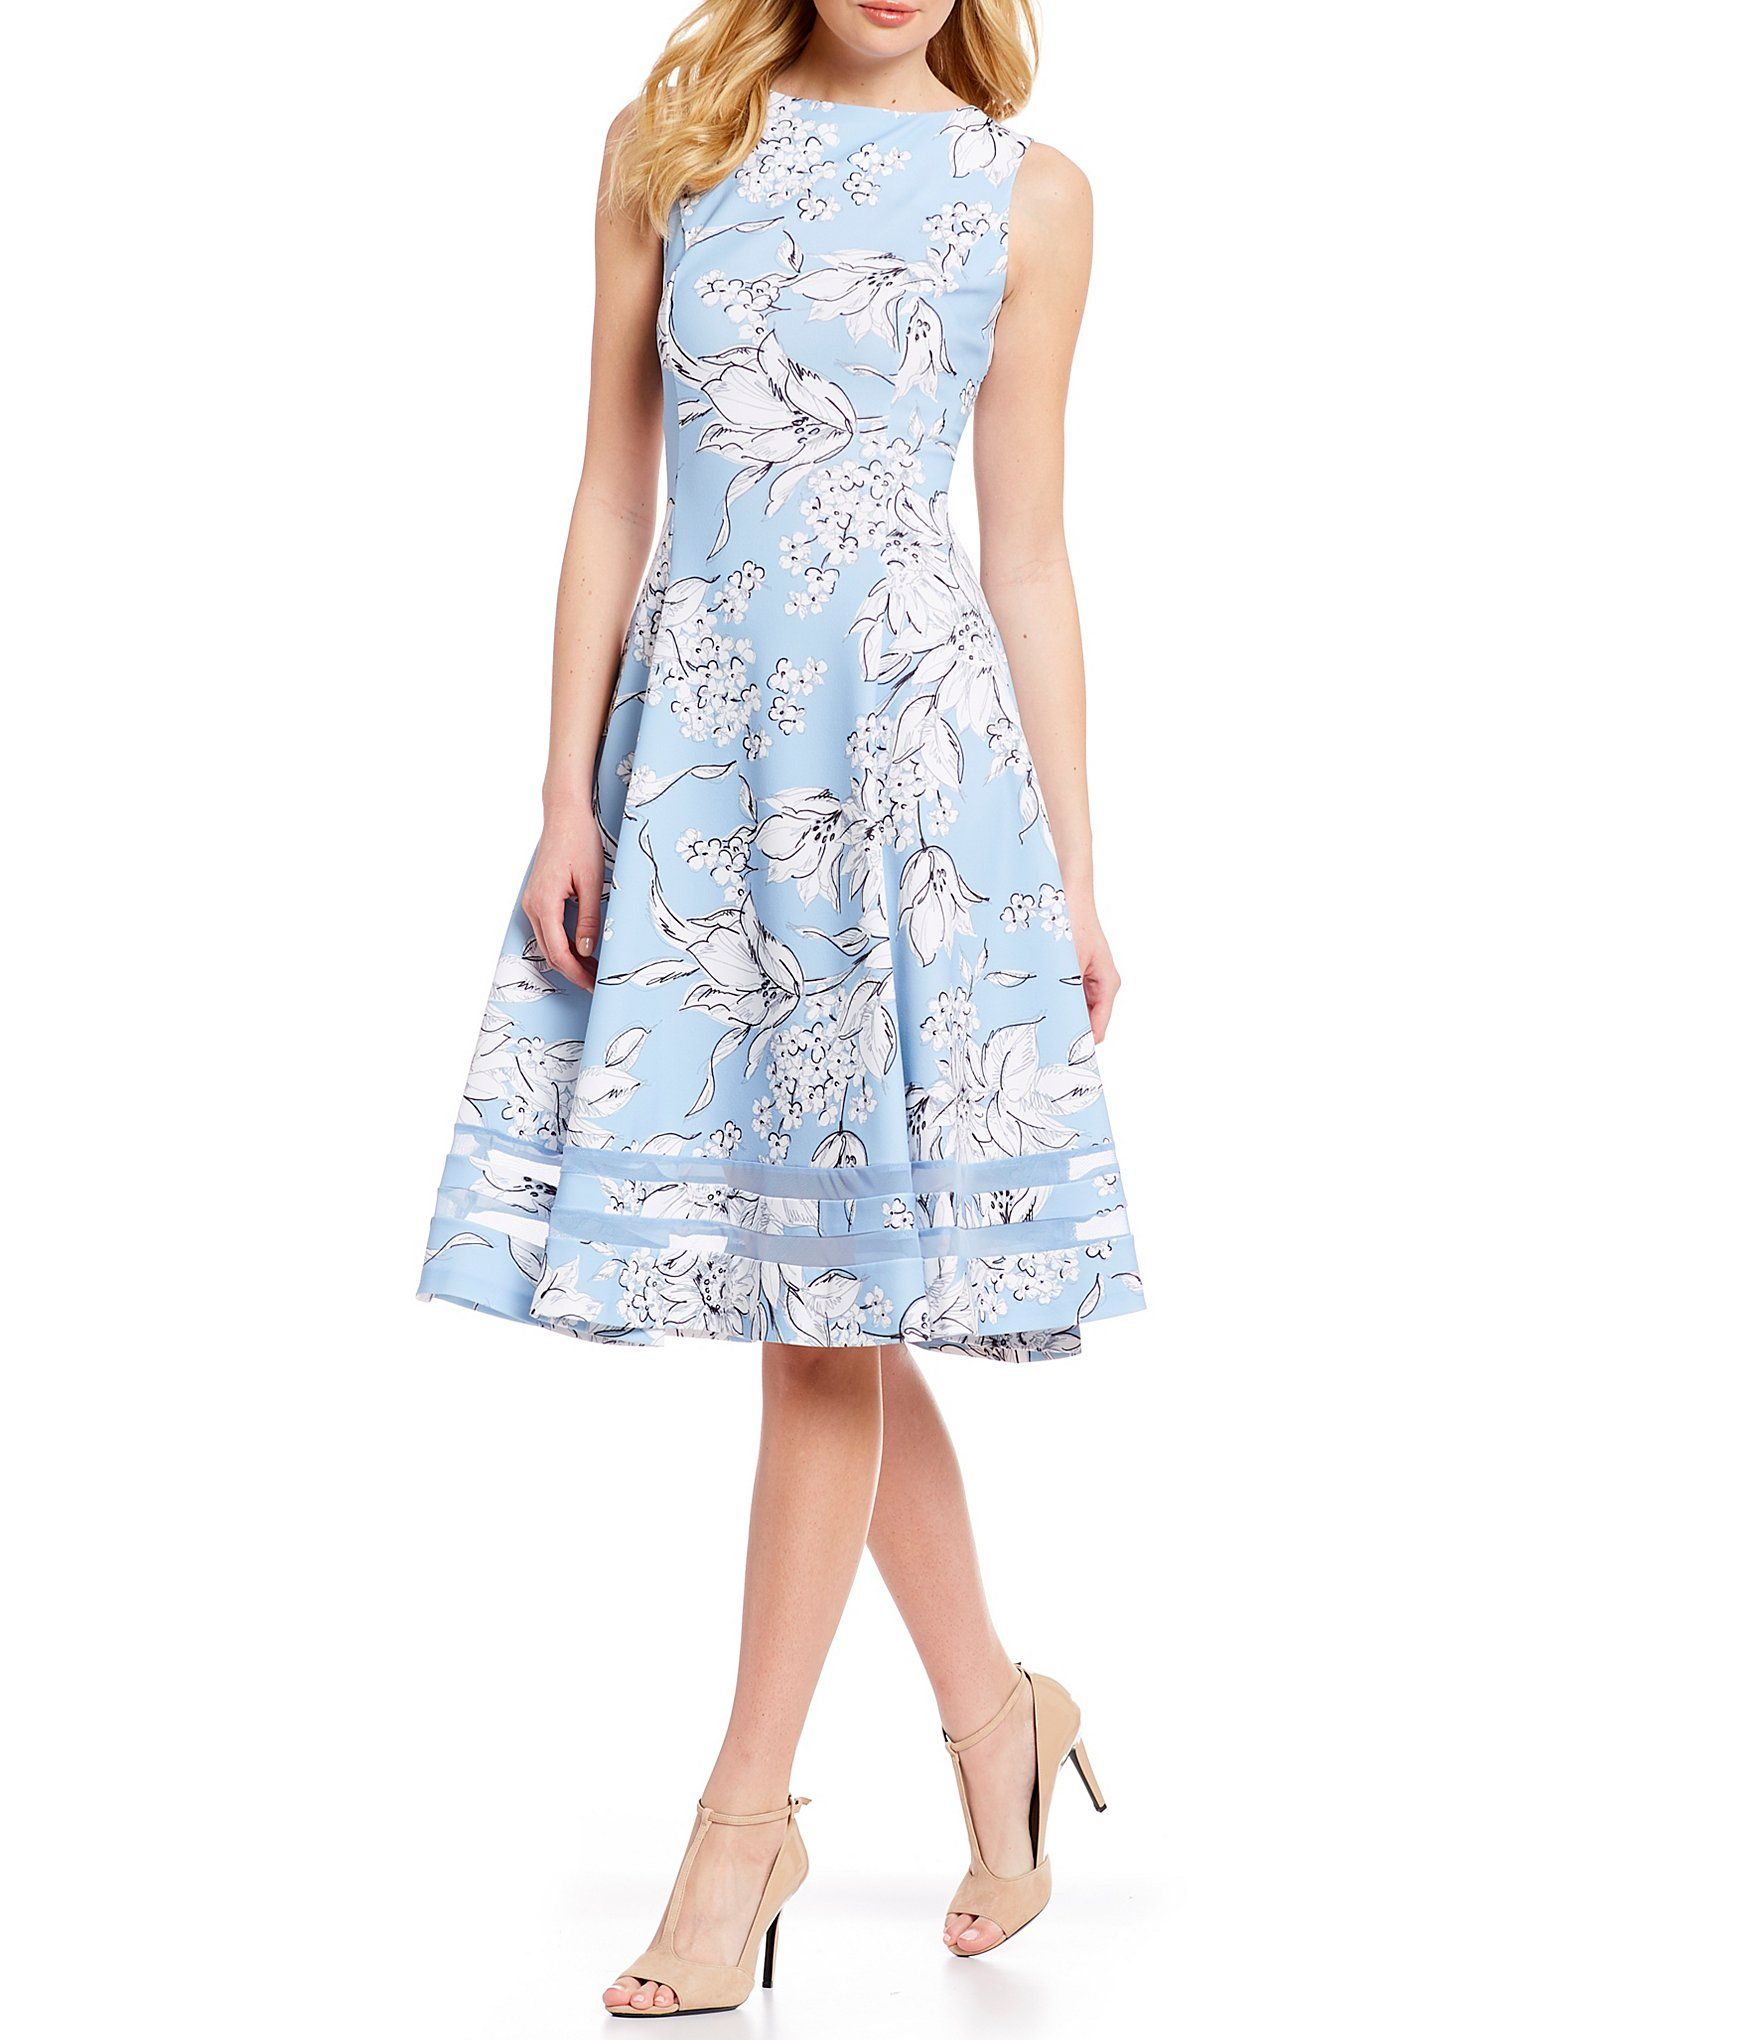 ff40657af09 Calvin Klein Sketch Floral Print Illusion Hem Sleeveless Fit   Flare Midi  Dress  Dillards